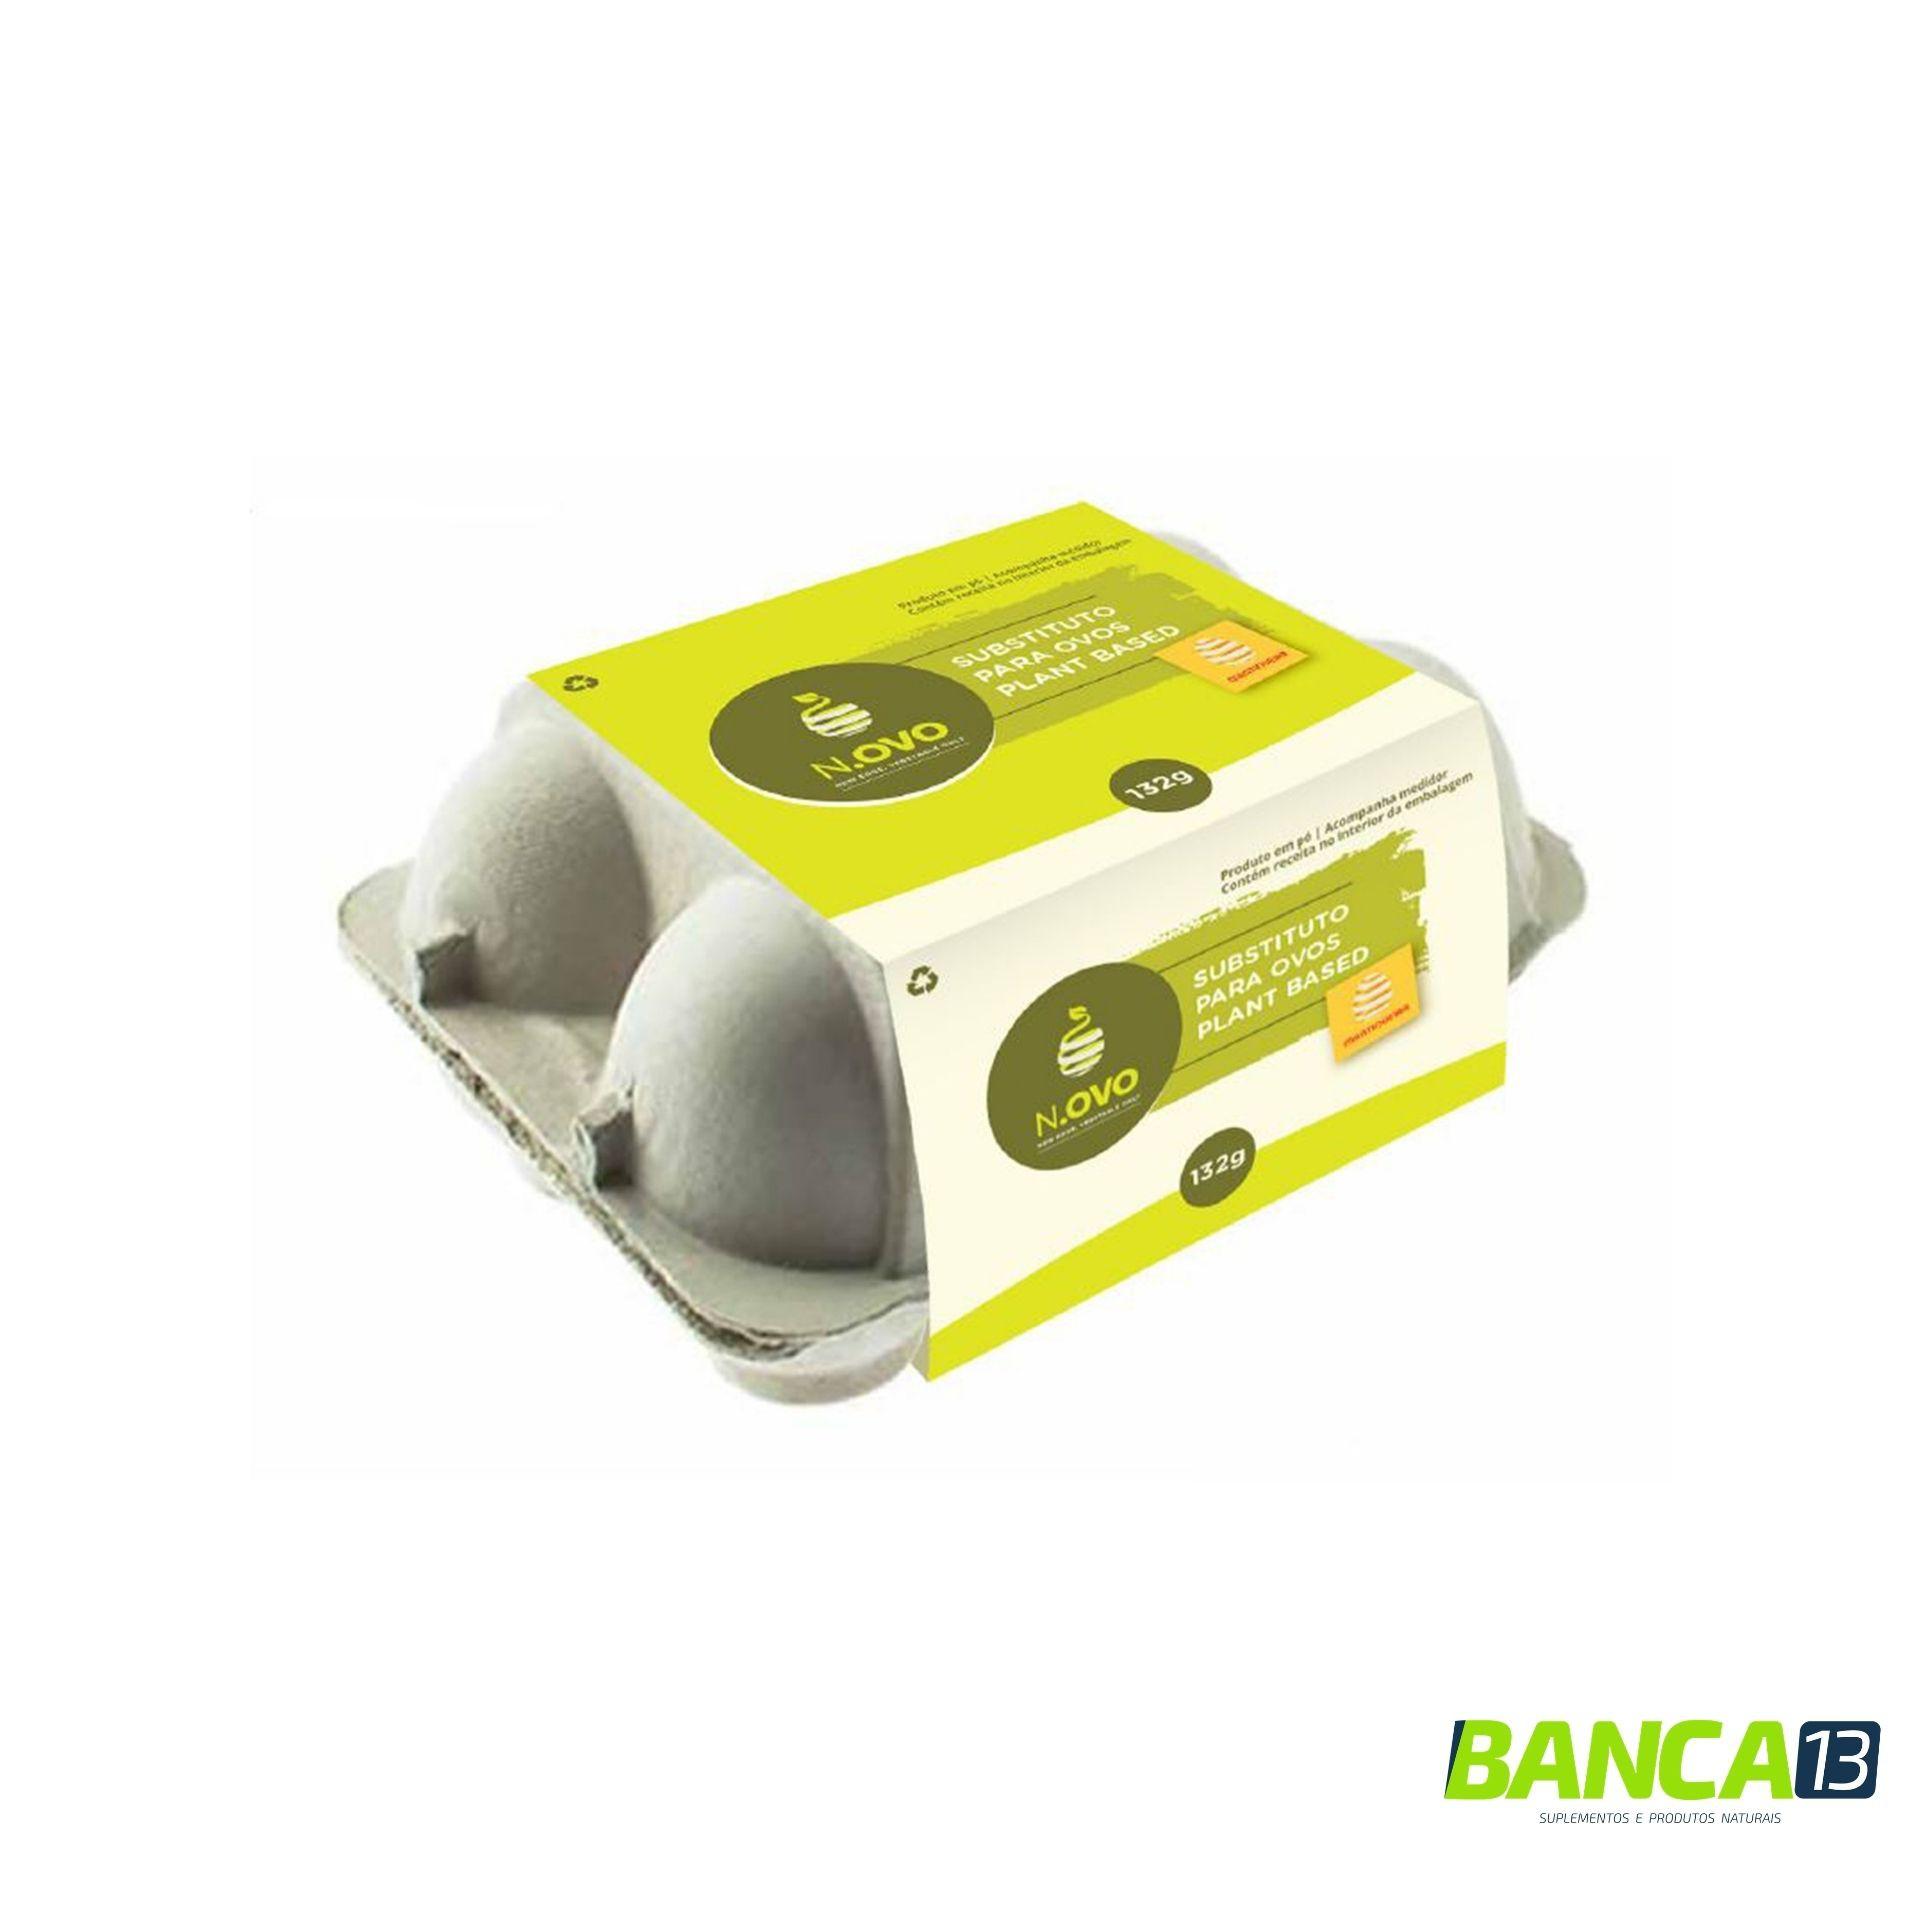 OVO VEGANO 132G - N.ovo – Substituto para Ovos Plant Based